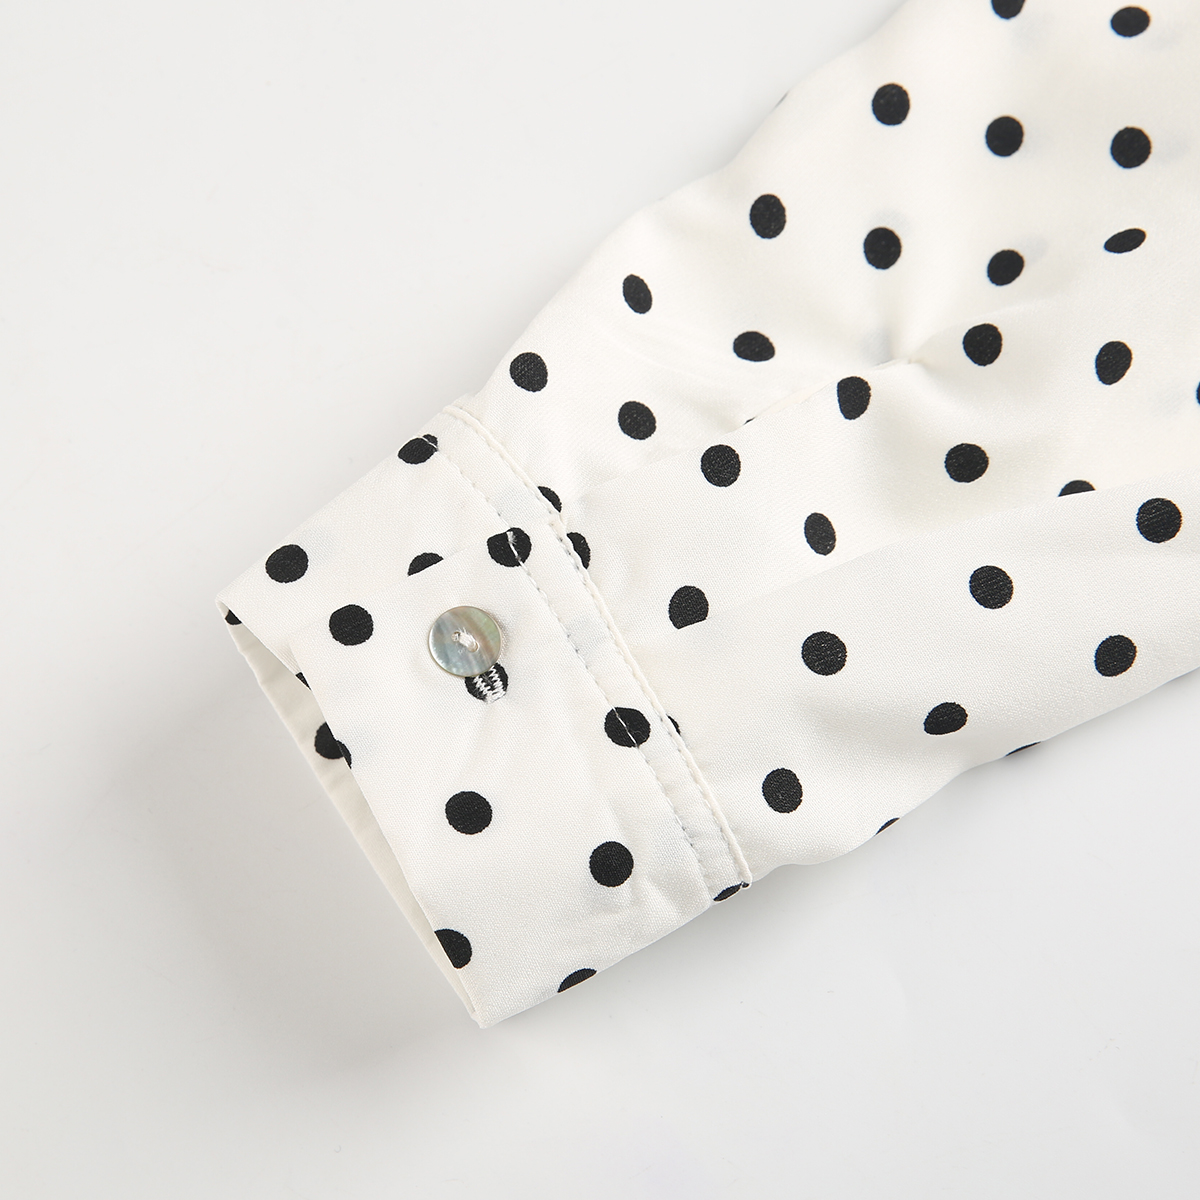 MCO New Basic Polka Dot Print Plus Size Women Blouse Casual Oversized Top Big Women Clothing Simple Spot Loose Shirt 5xl 6xl 7xl 4